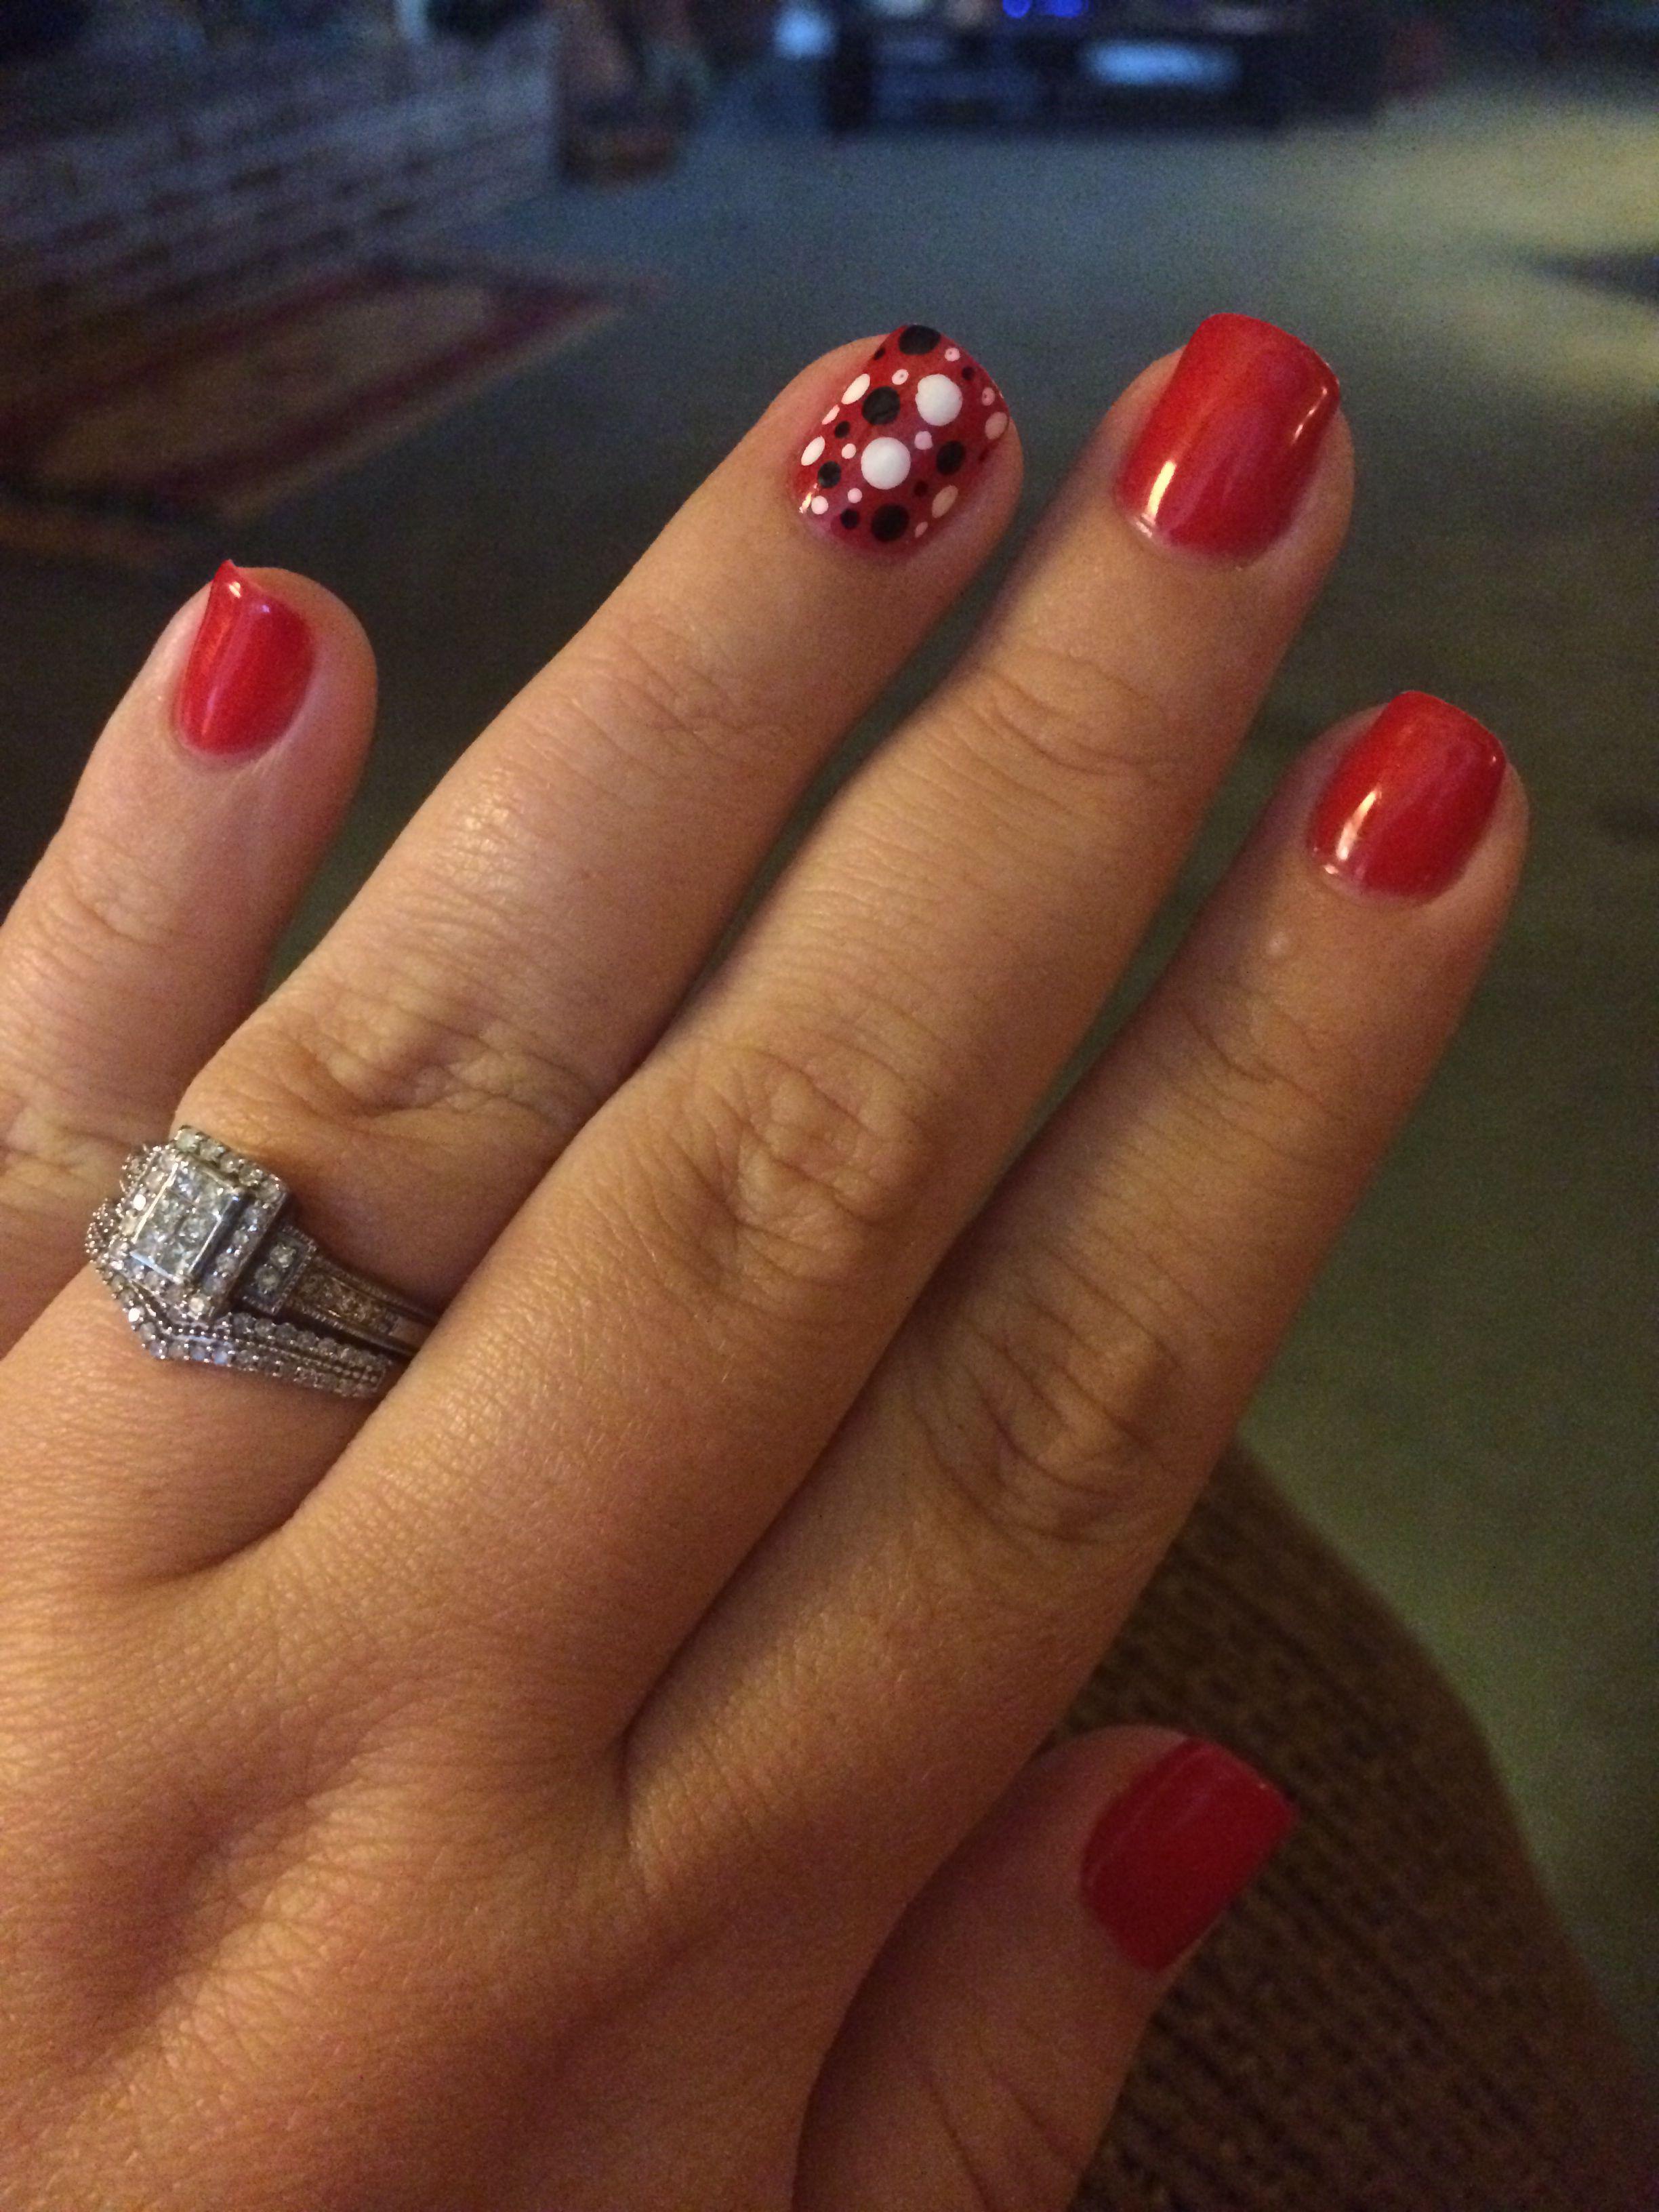 Georgia Bulldogs UGA nails! | Nails! | Pinterest | Georgia bulldogs ...